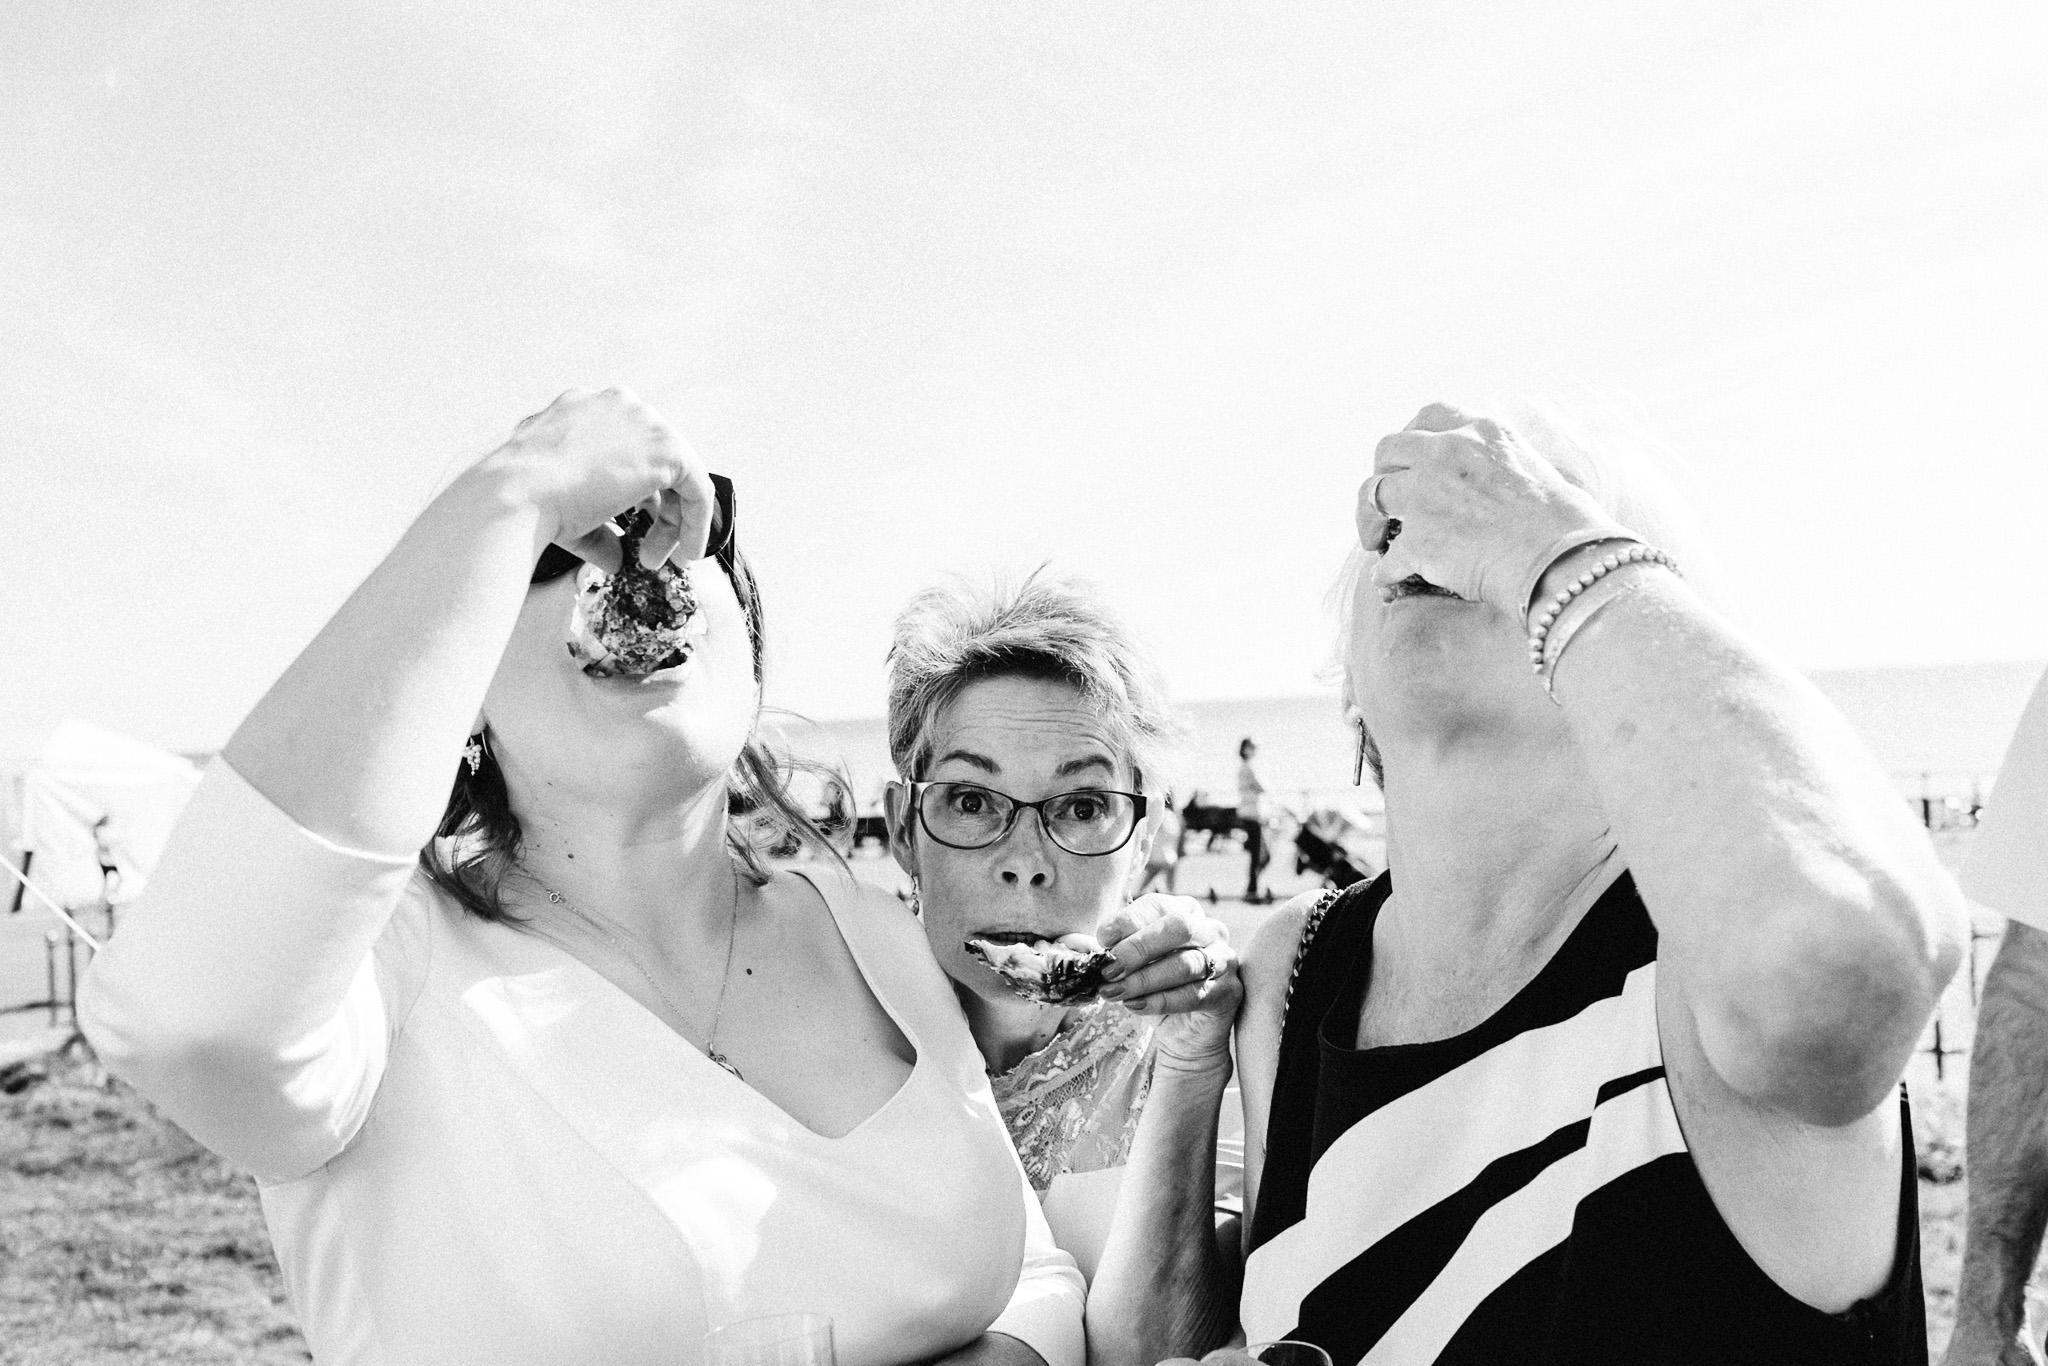 st_andrews_fabrica_brighton_wedding_581.jpg